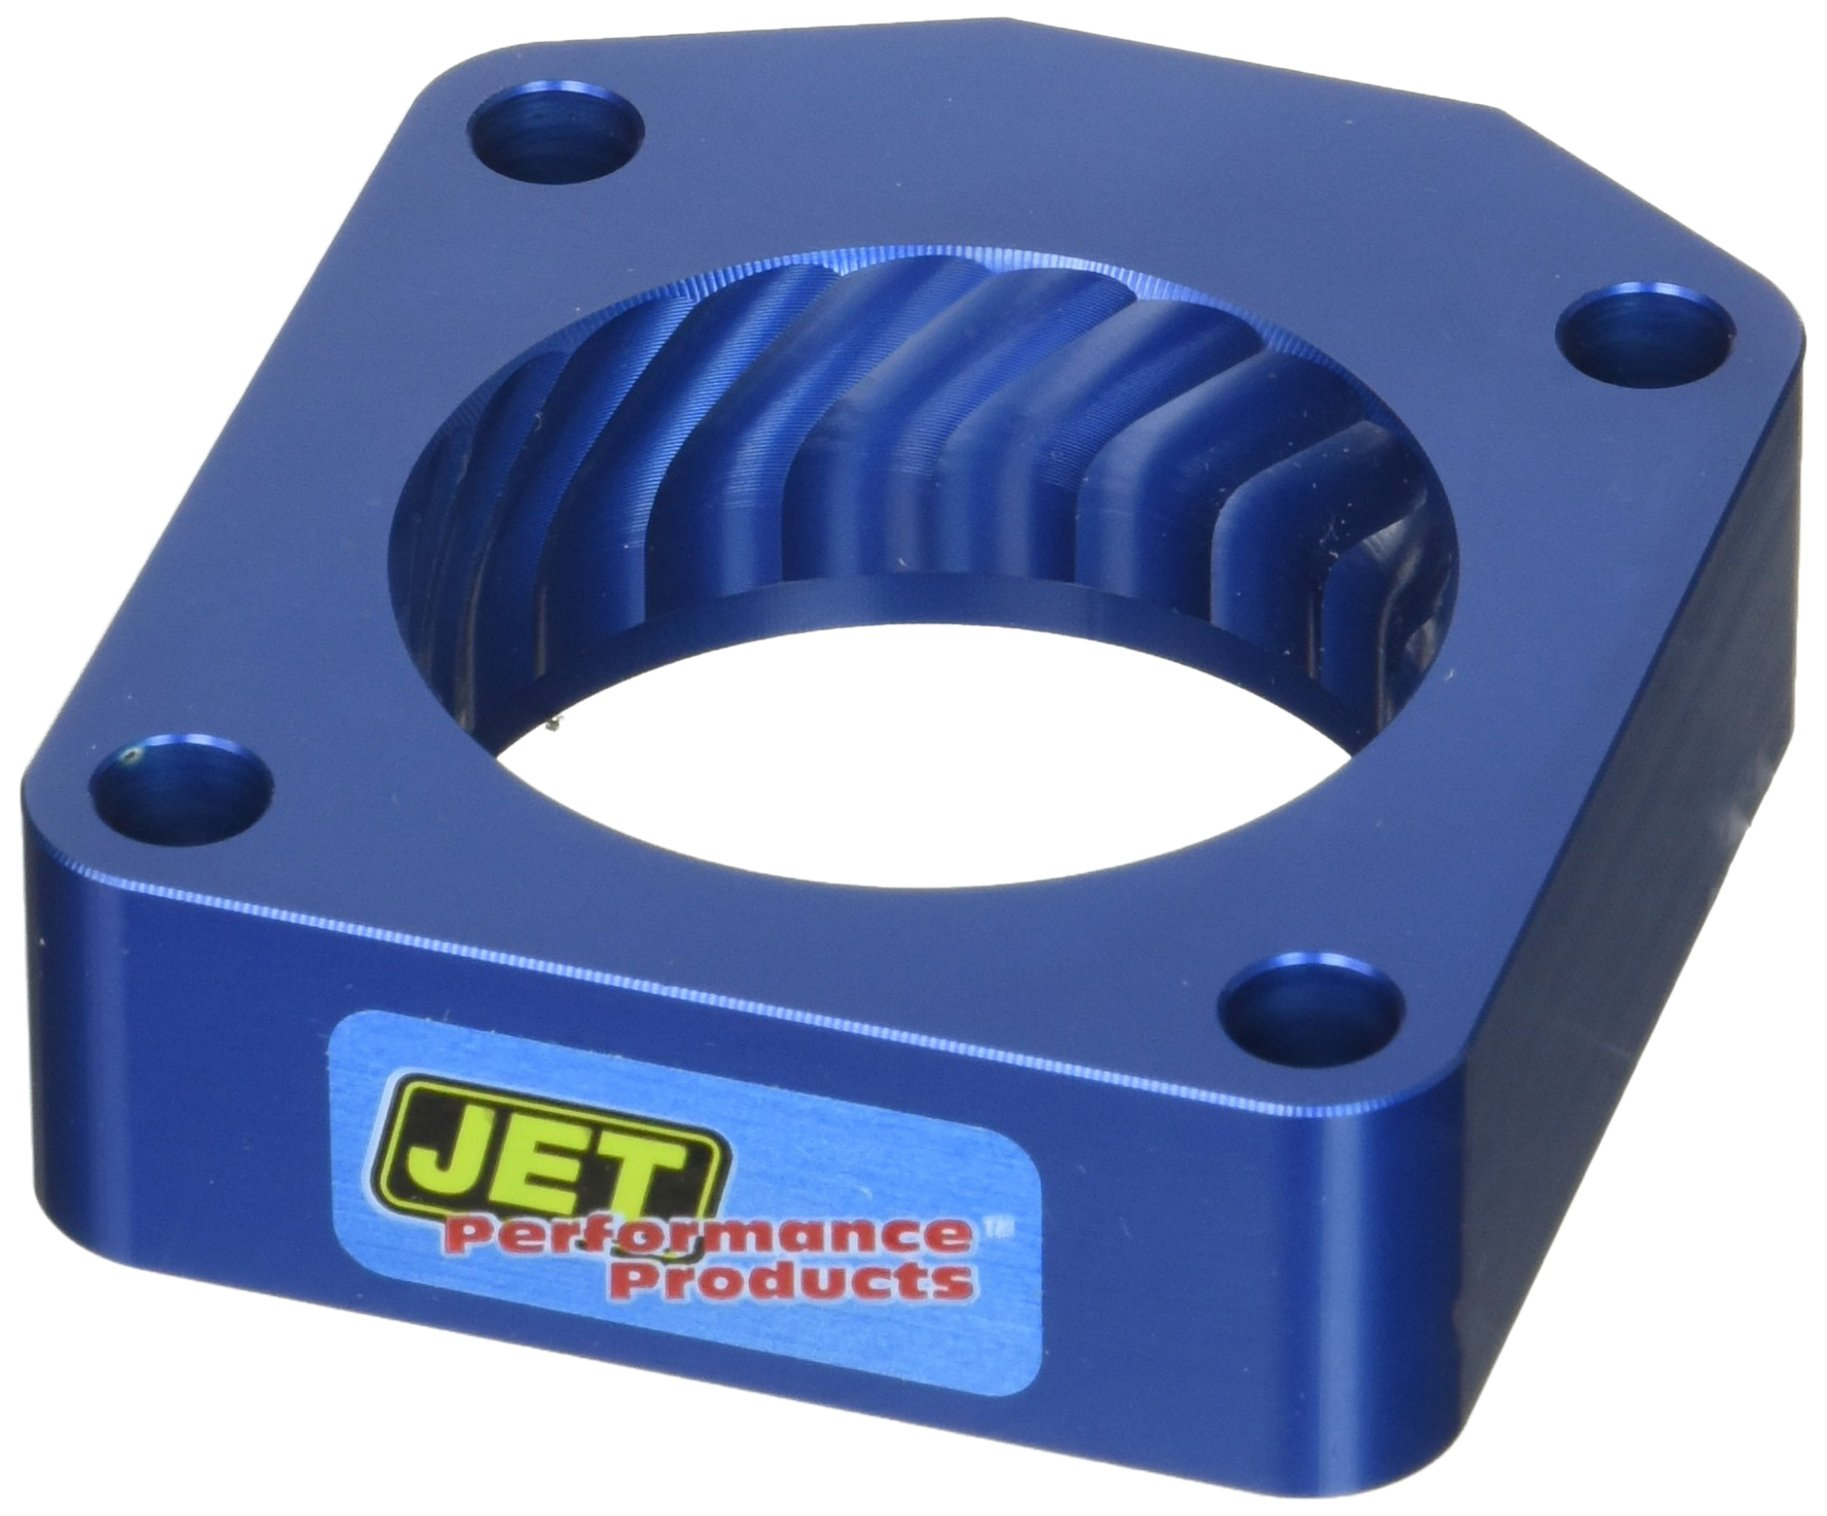 JET 62164 Powr-Flo Spacer by Jet Performance